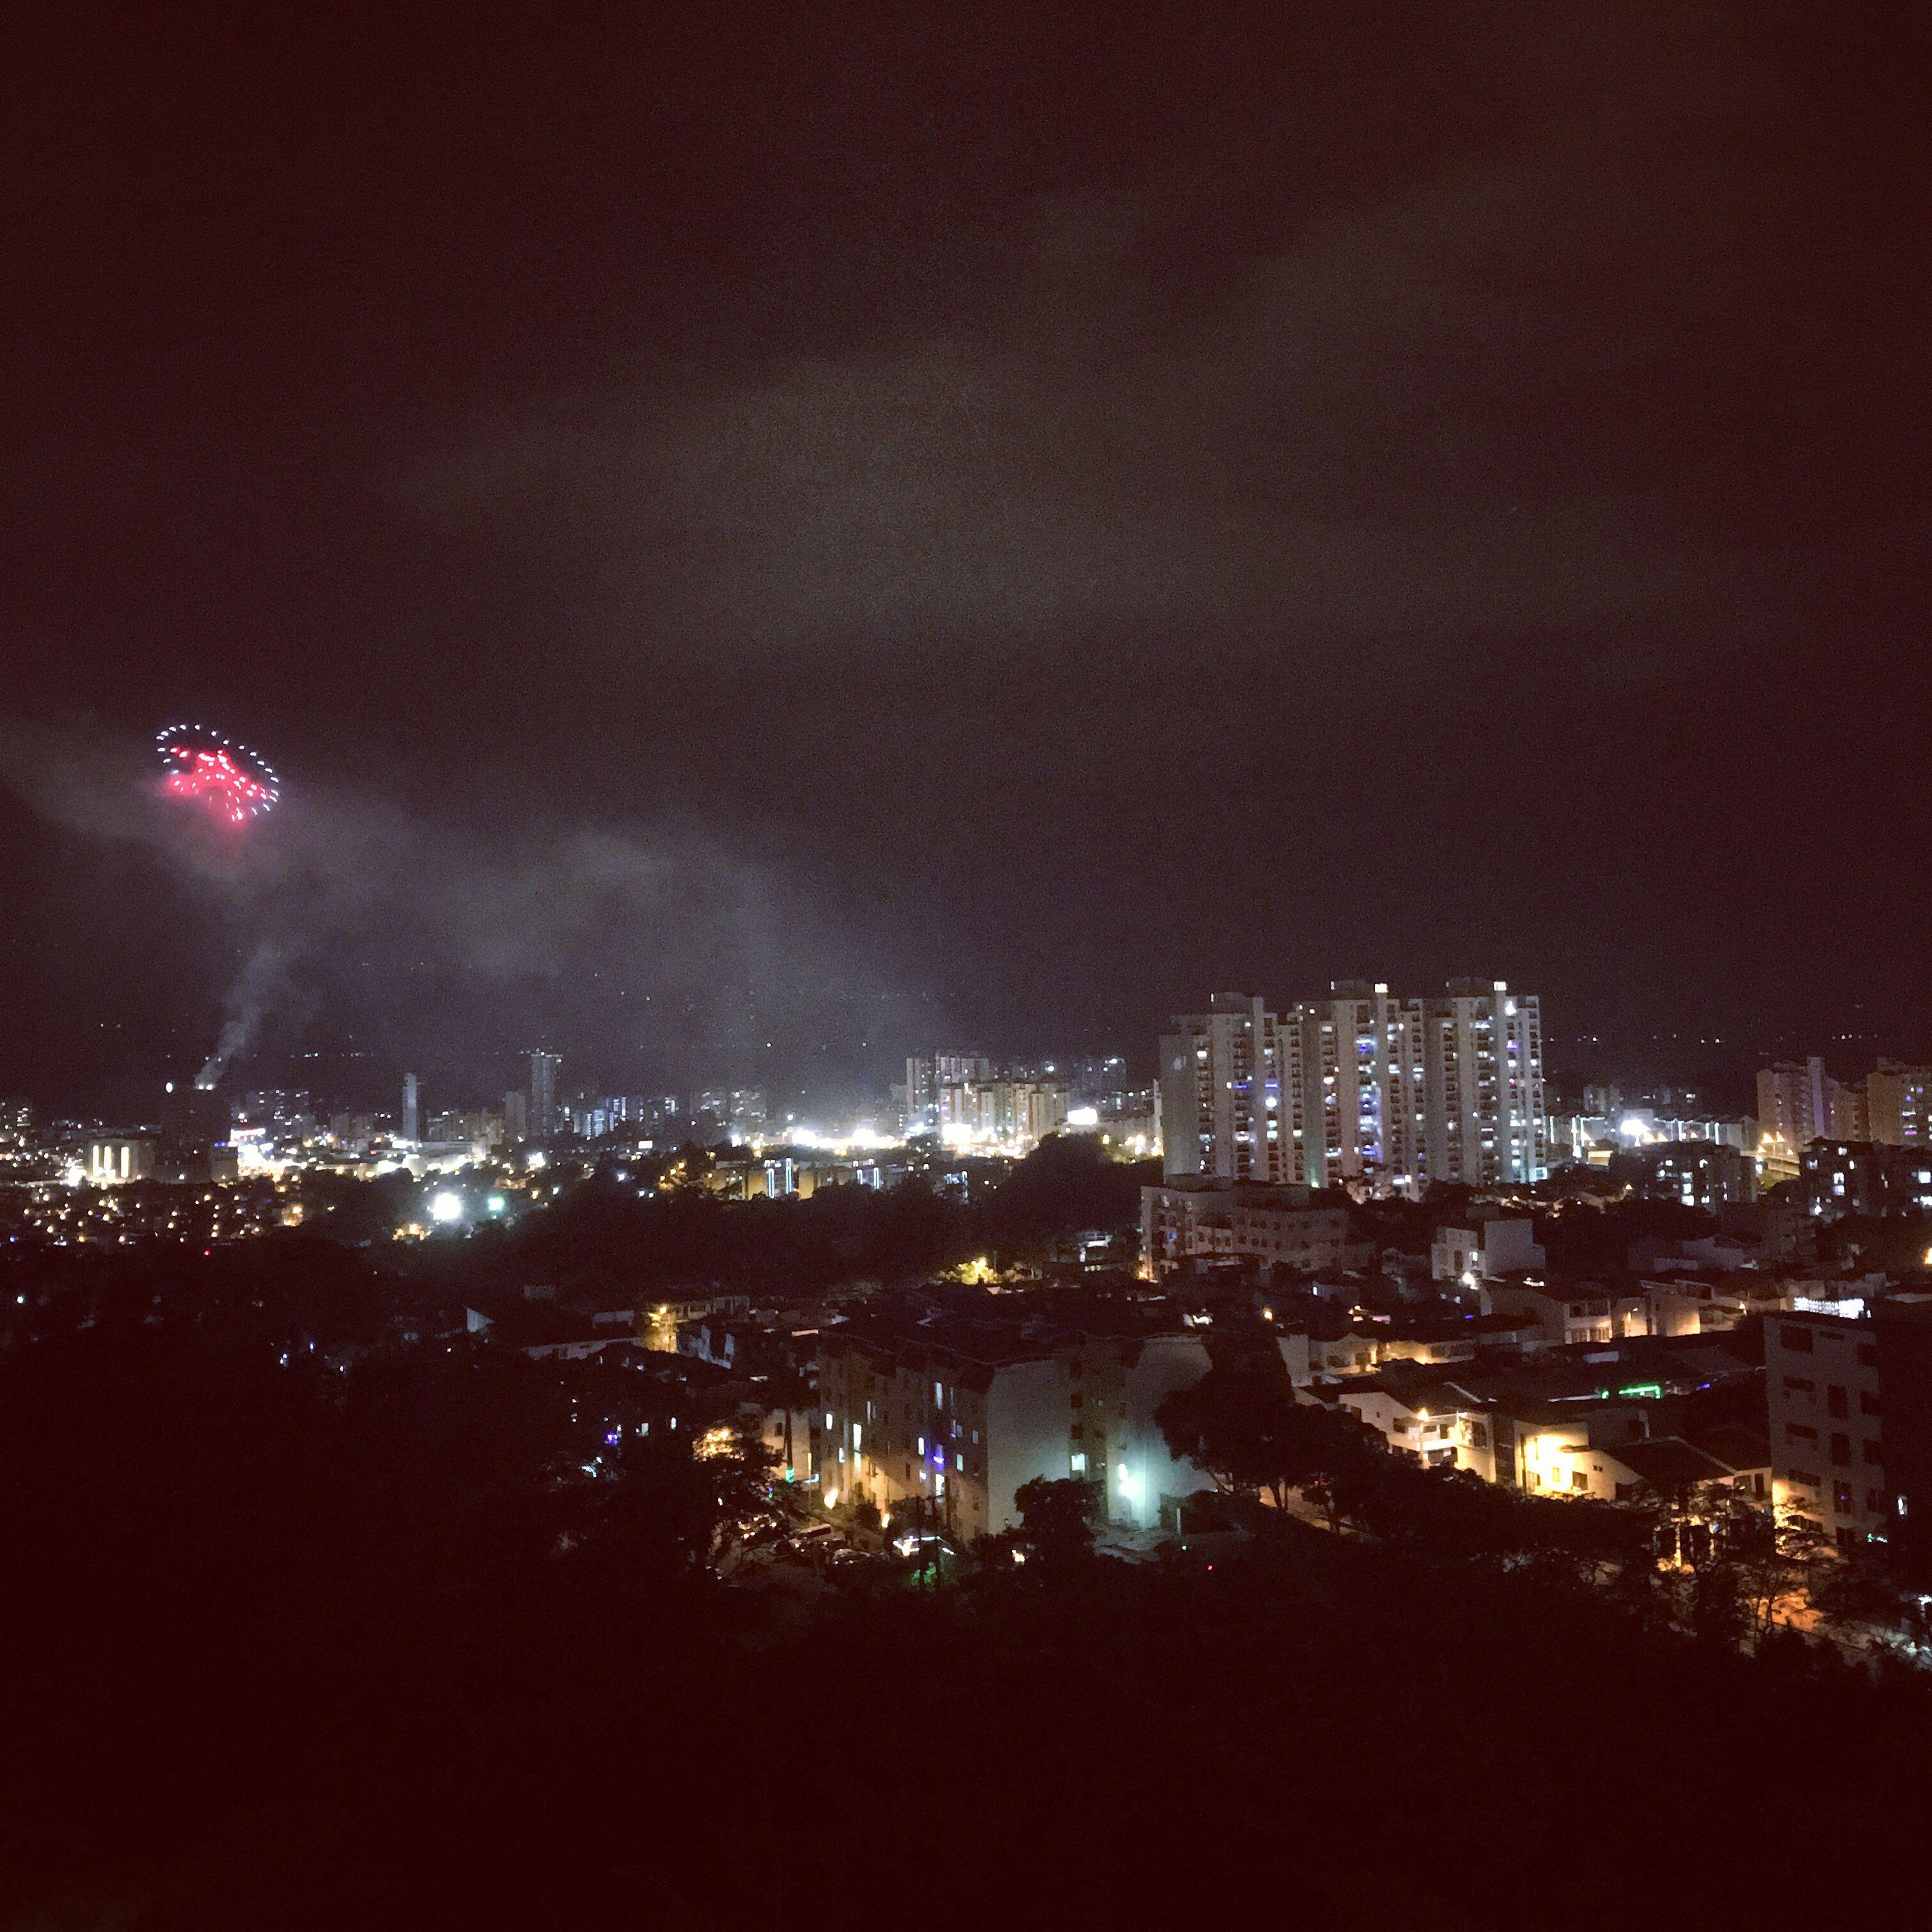 night, illuminated, city, sky, outdoors, architecture, cityscape, building exterior, urban skyline, skyscraper, no people, star - space